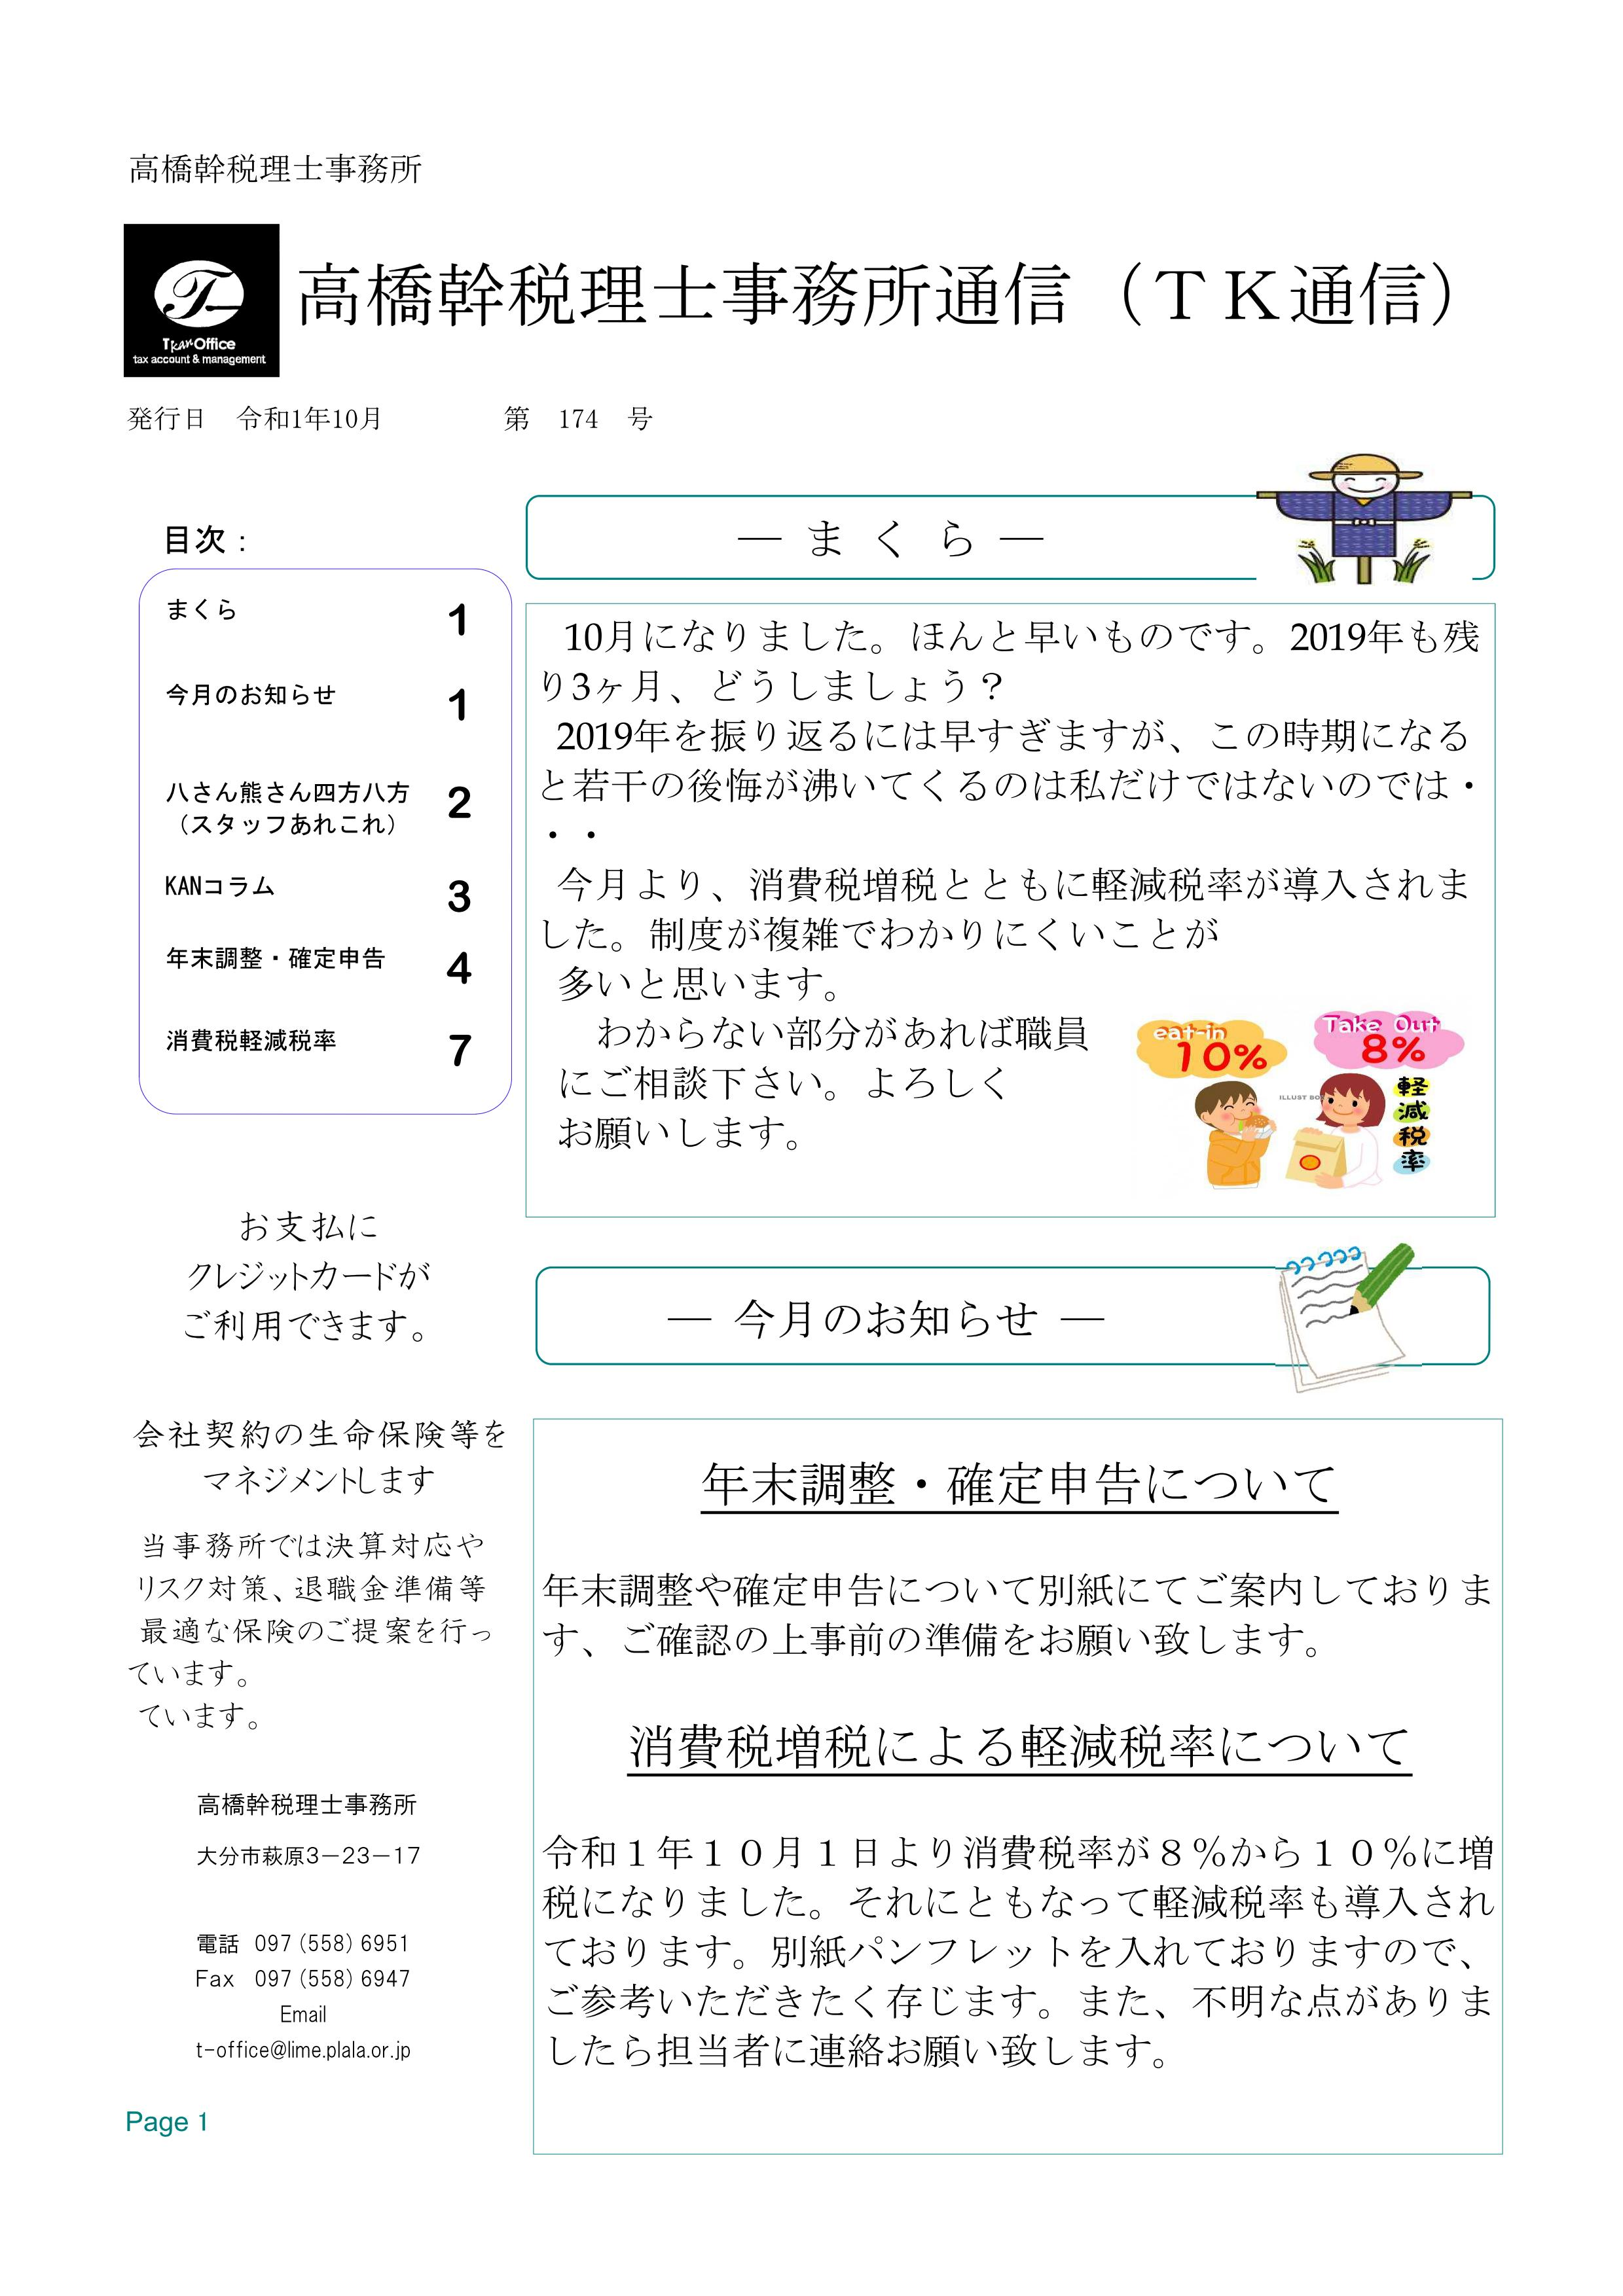 NLR1.10_01.jpg